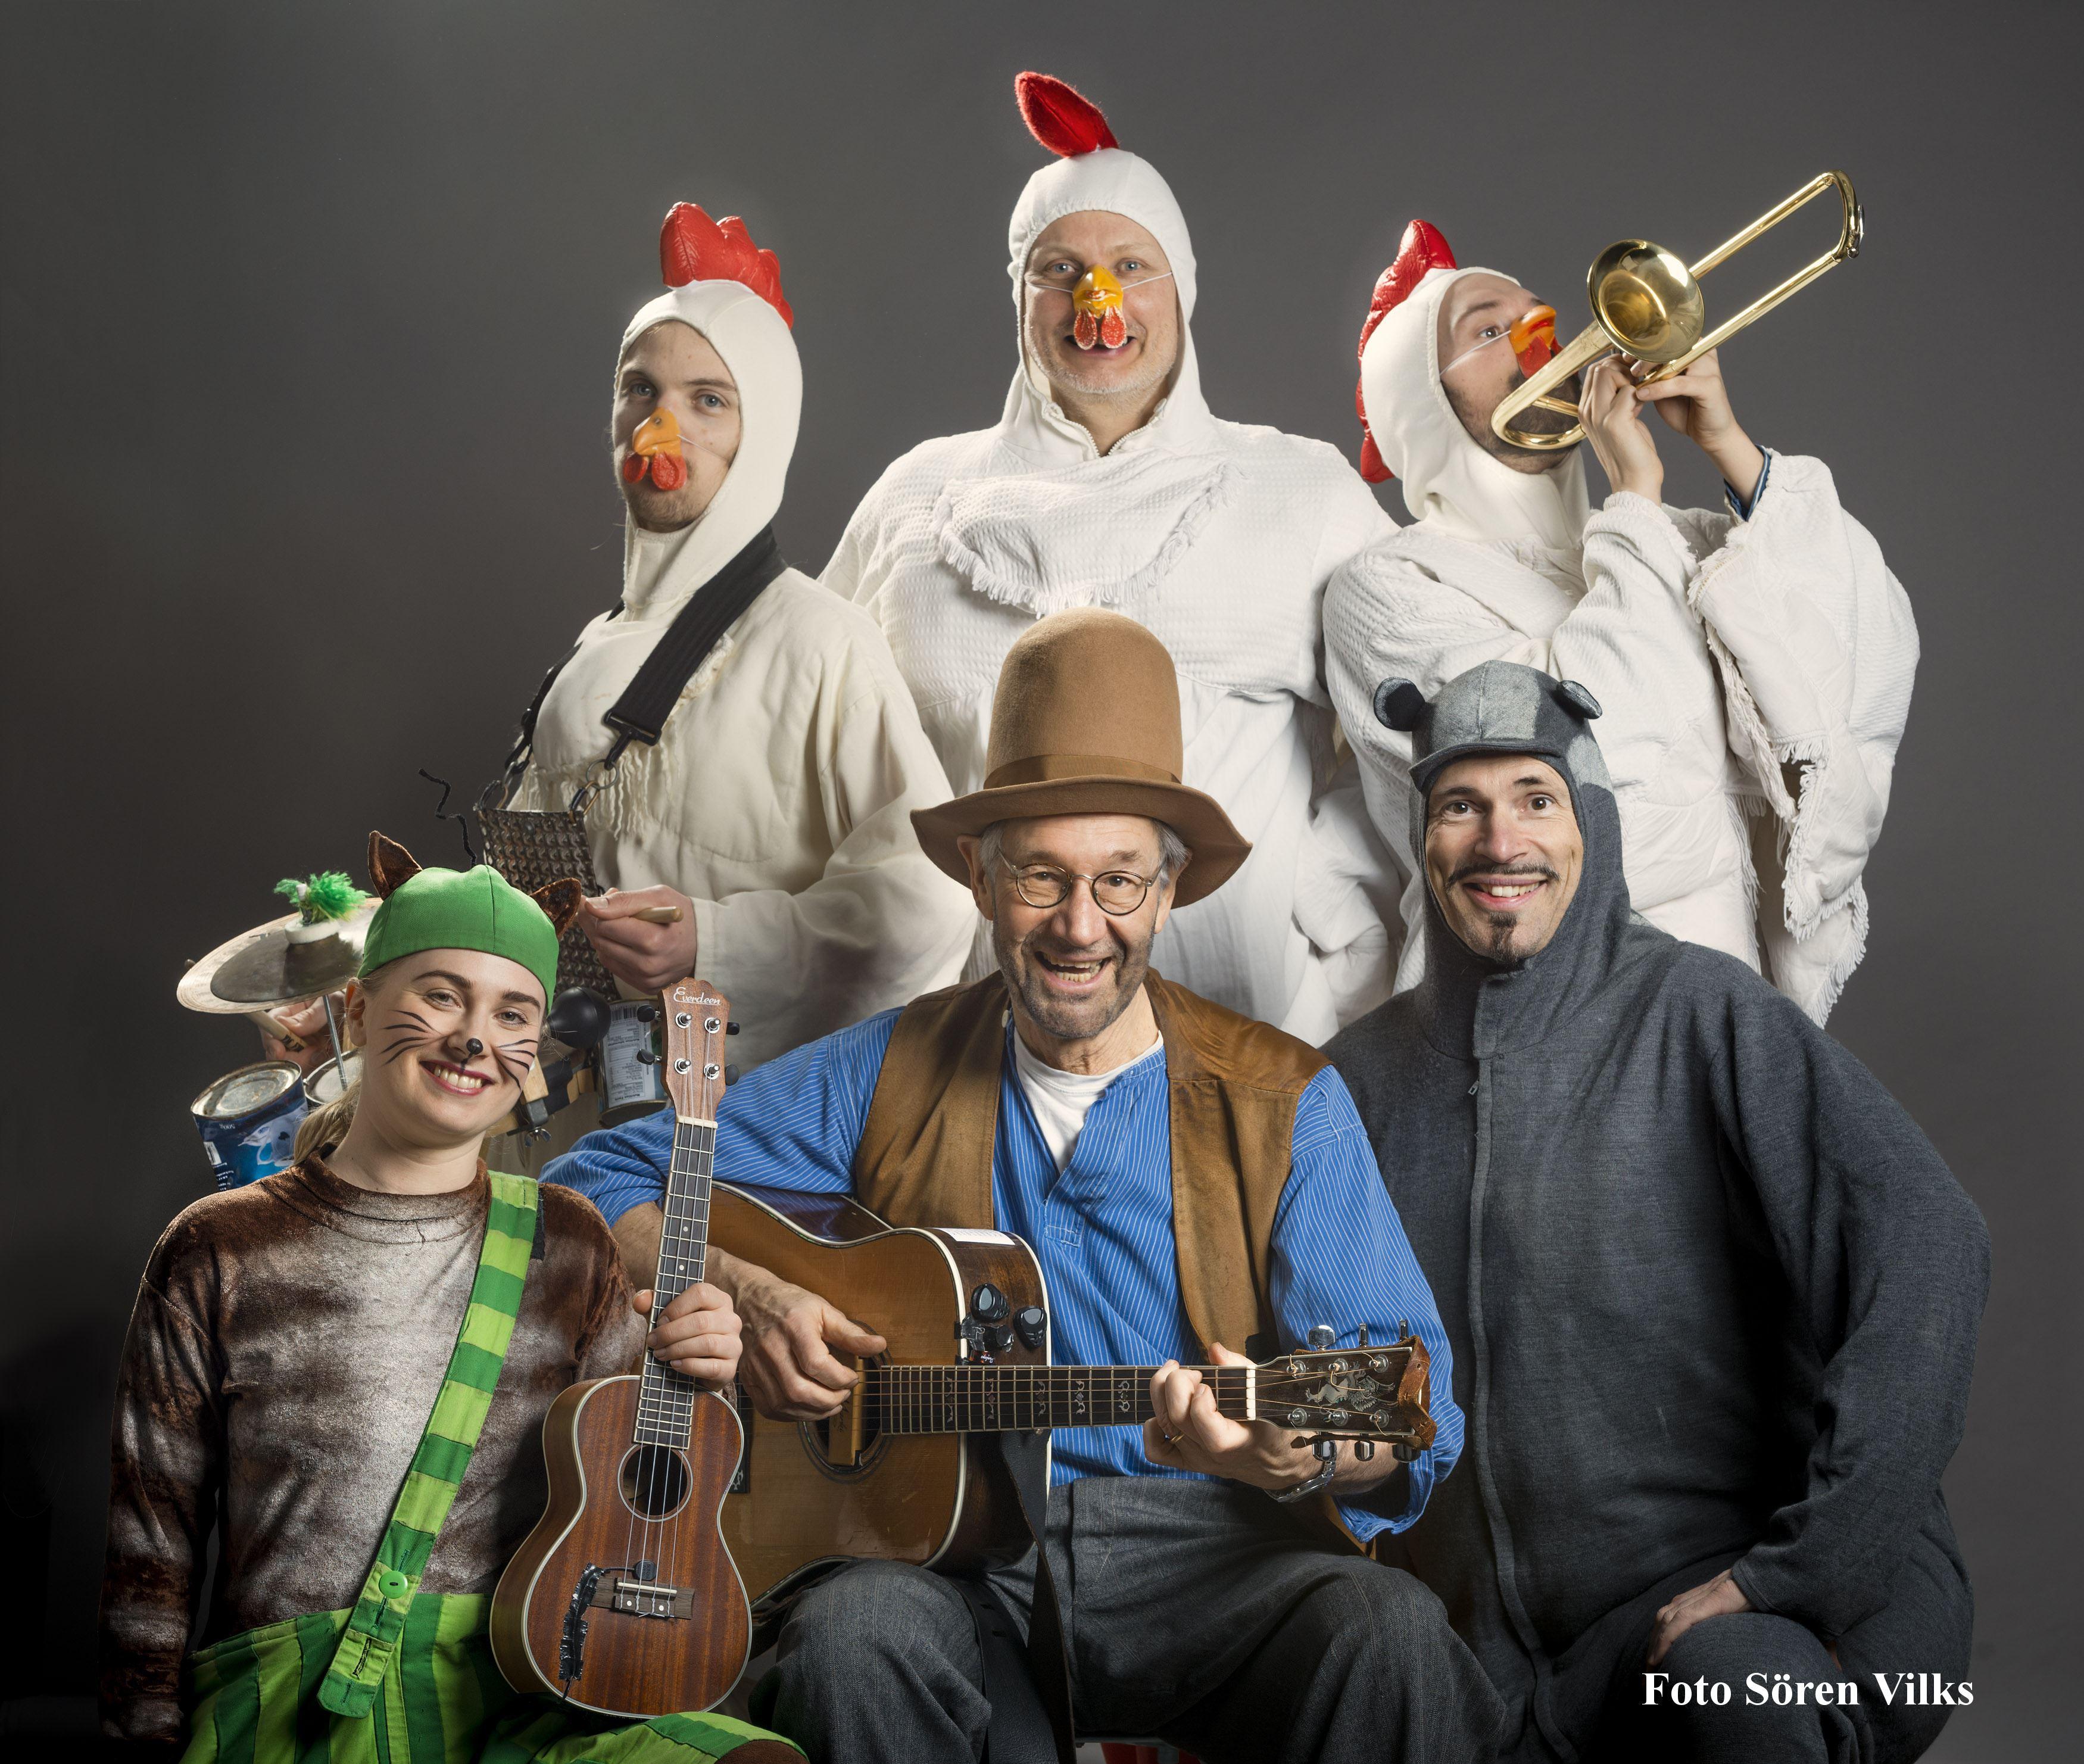 Pettsons gård - 25 års jubileum